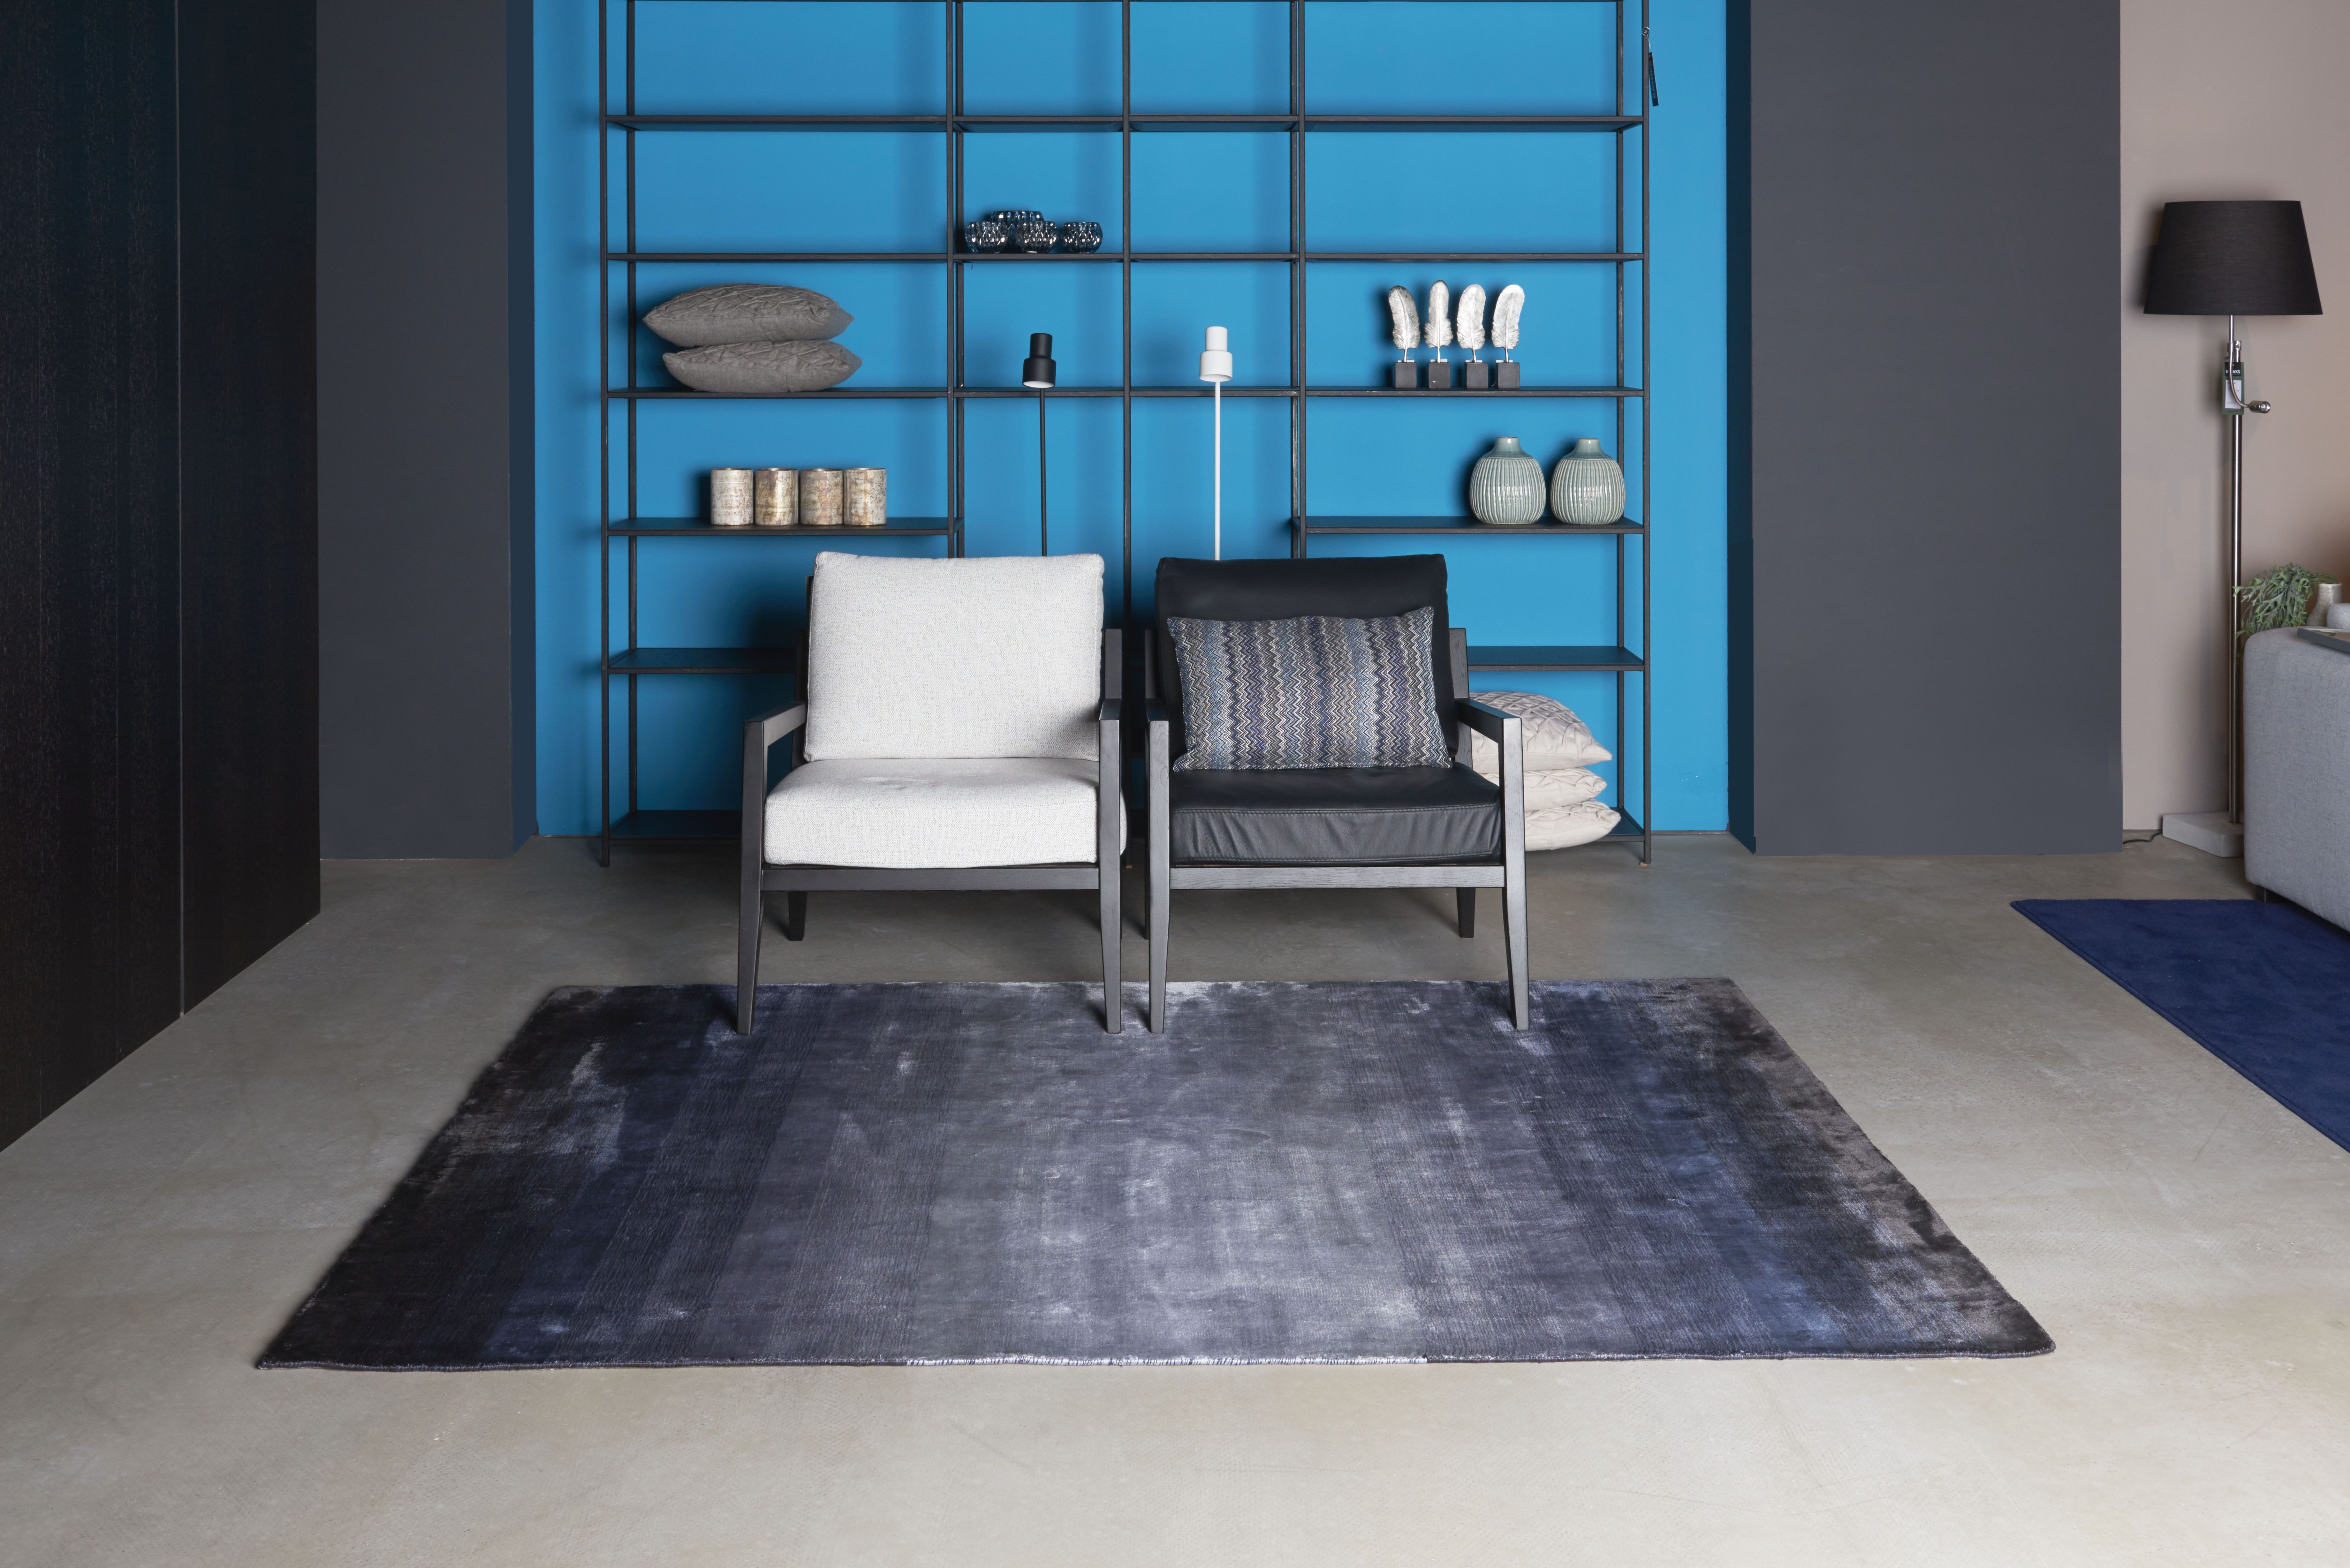 Brinker Carpets Varrayon Carpet Made Of 100 Tencel And Hand Woven In India Vloerkleed Blauw Tapijt Vloerverwarming